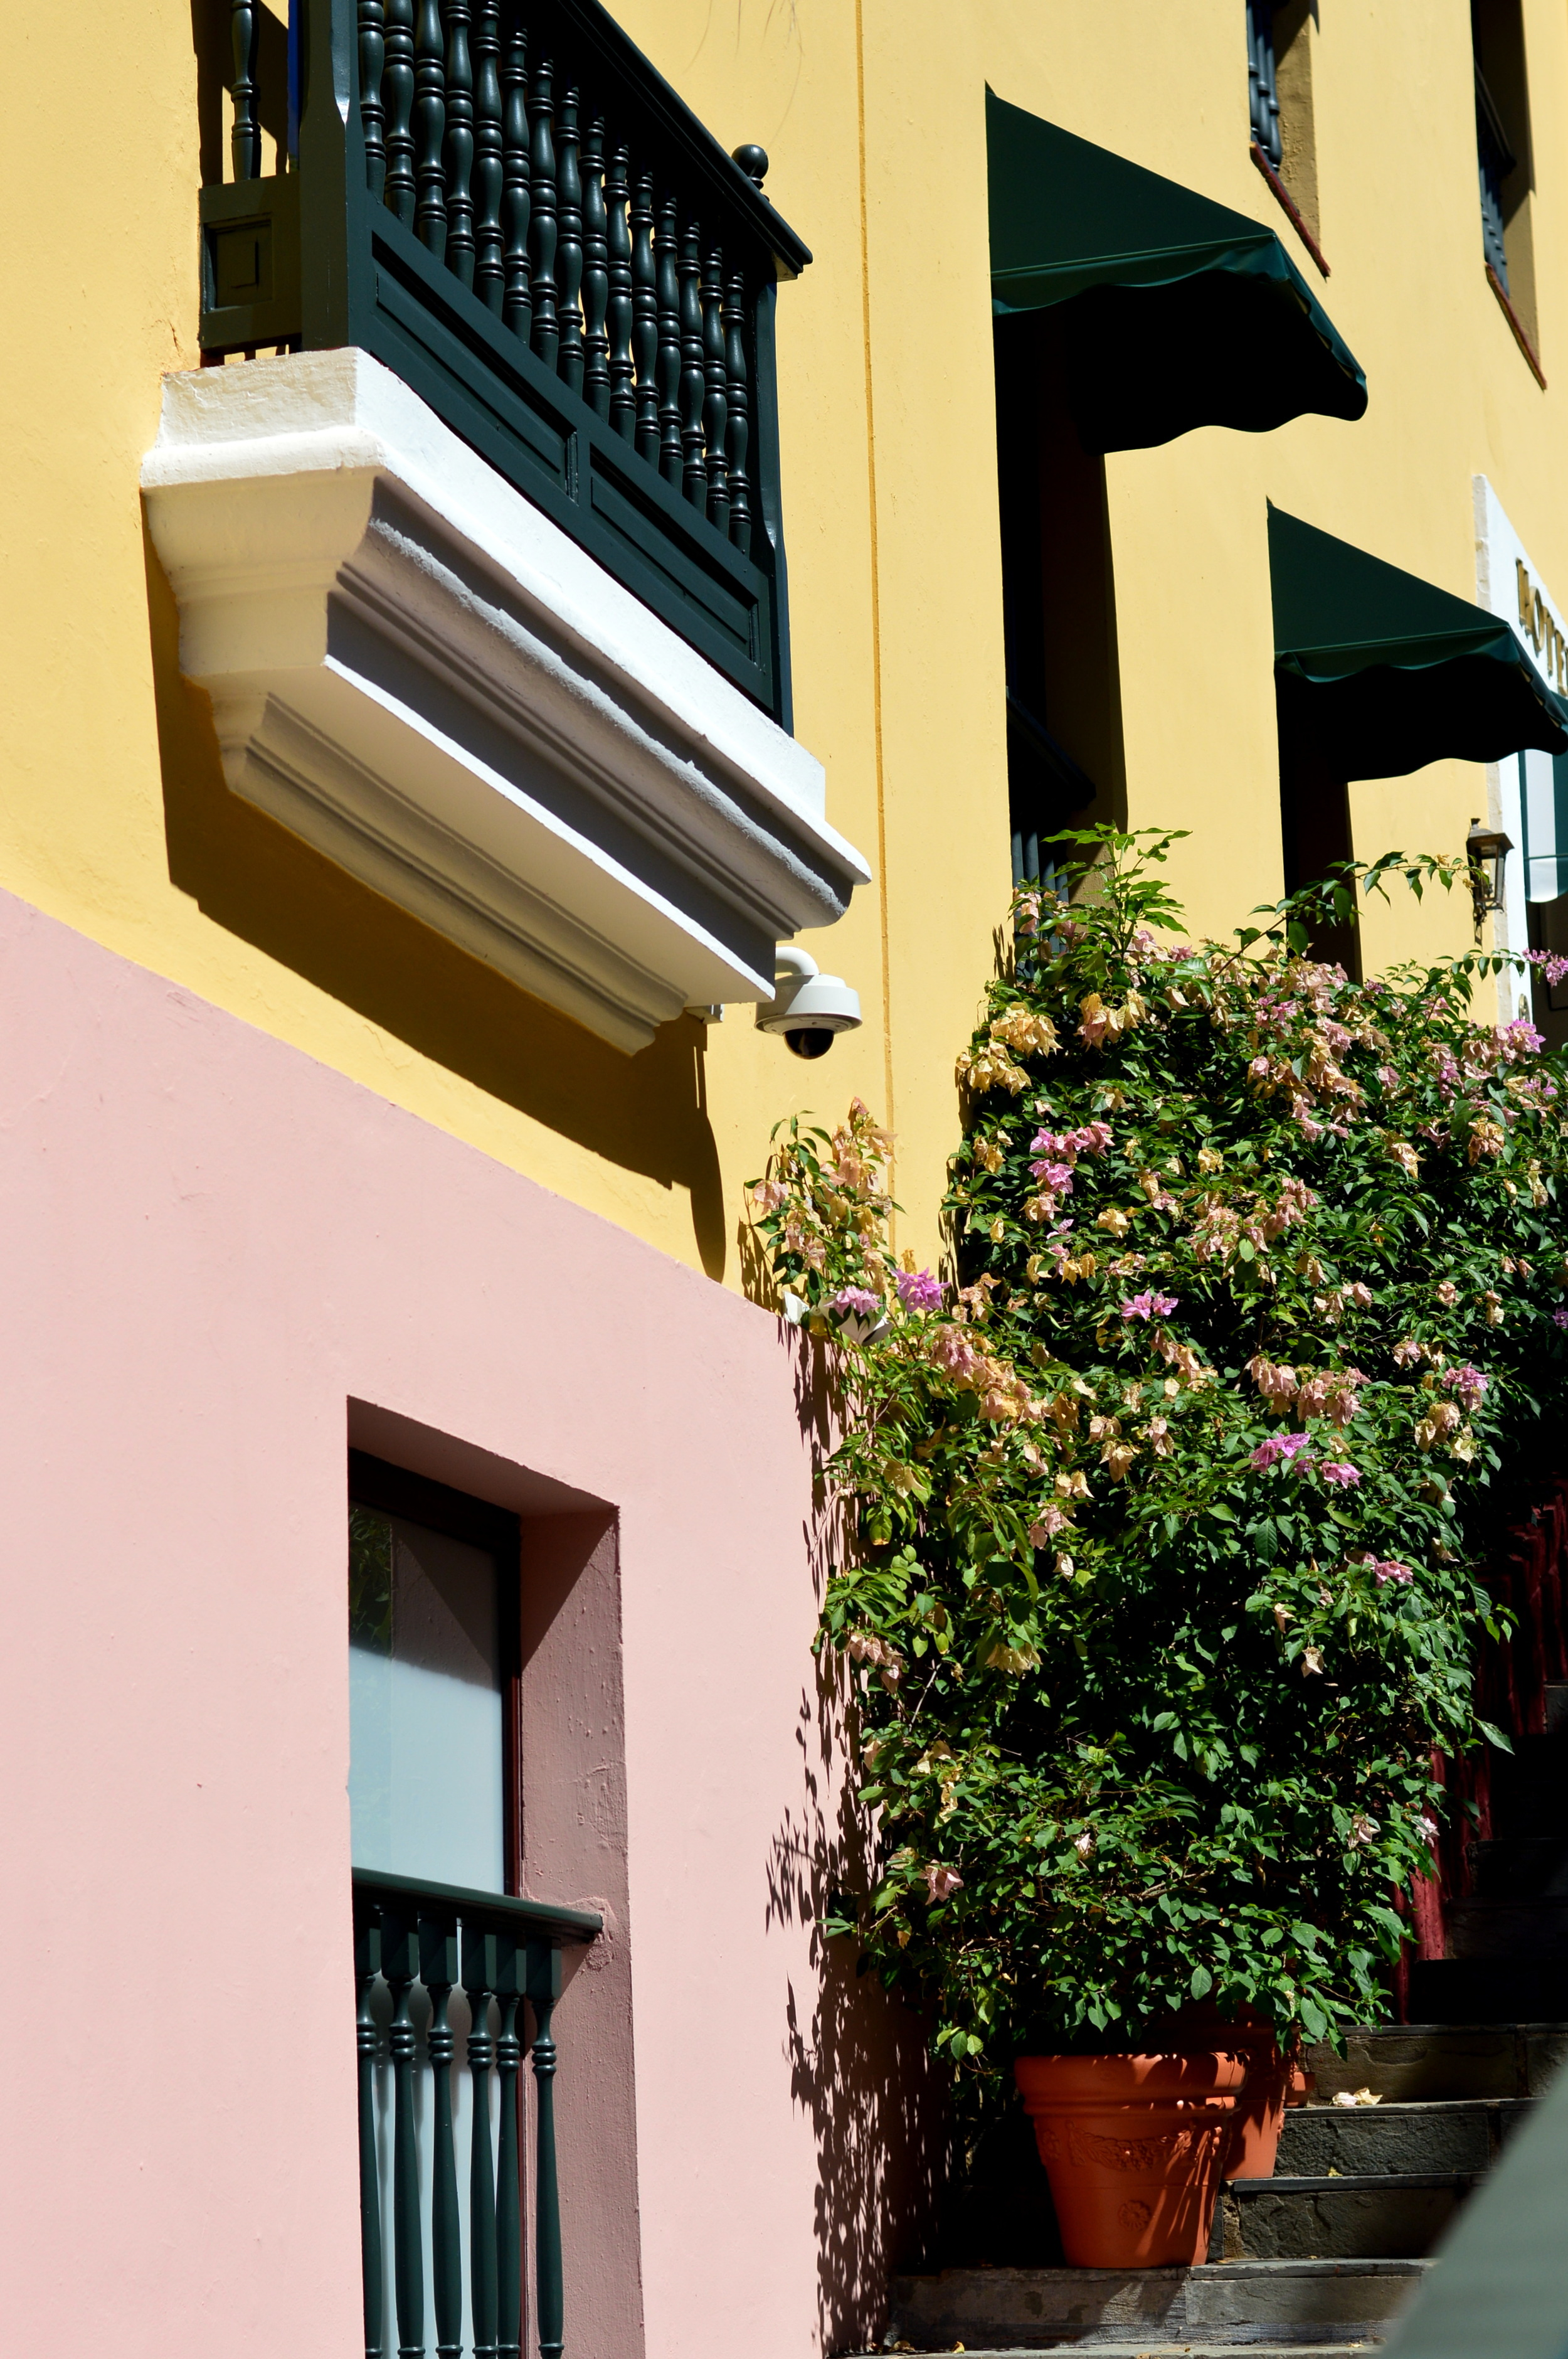 old-san-juan-puerto-rico-travel-guide